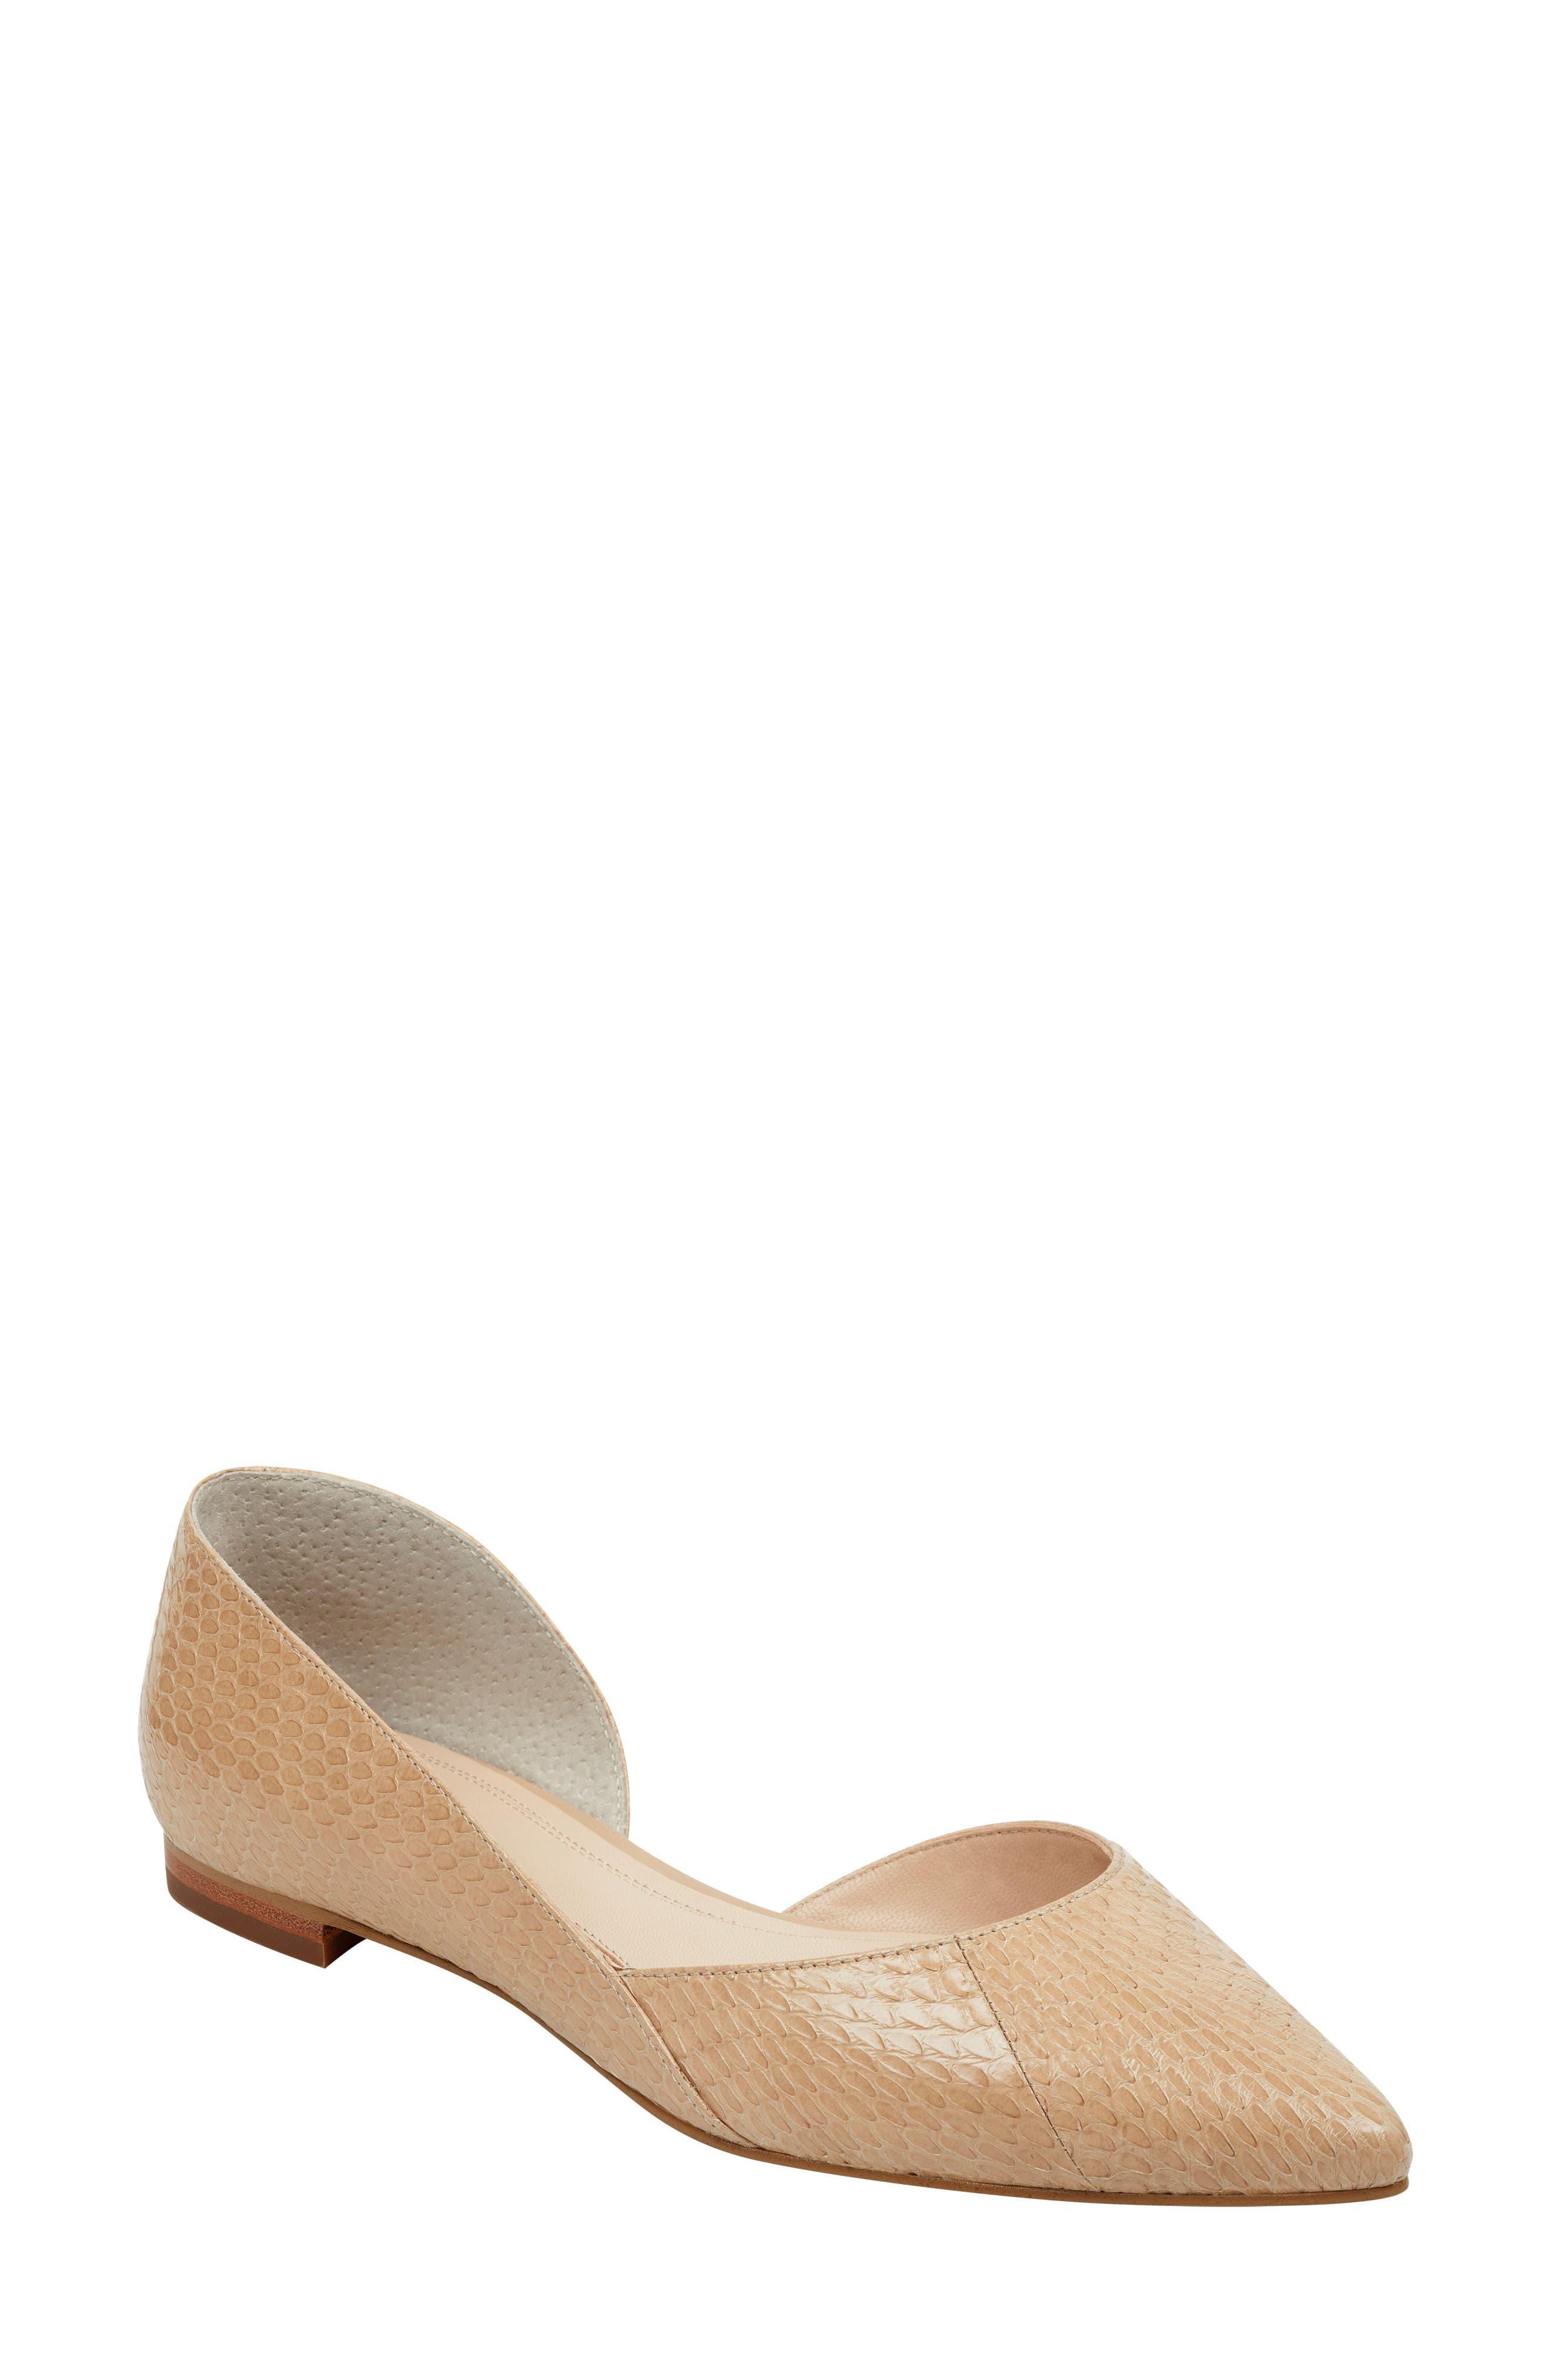 3857cc0f5b Marc Fisher Women's Shoes